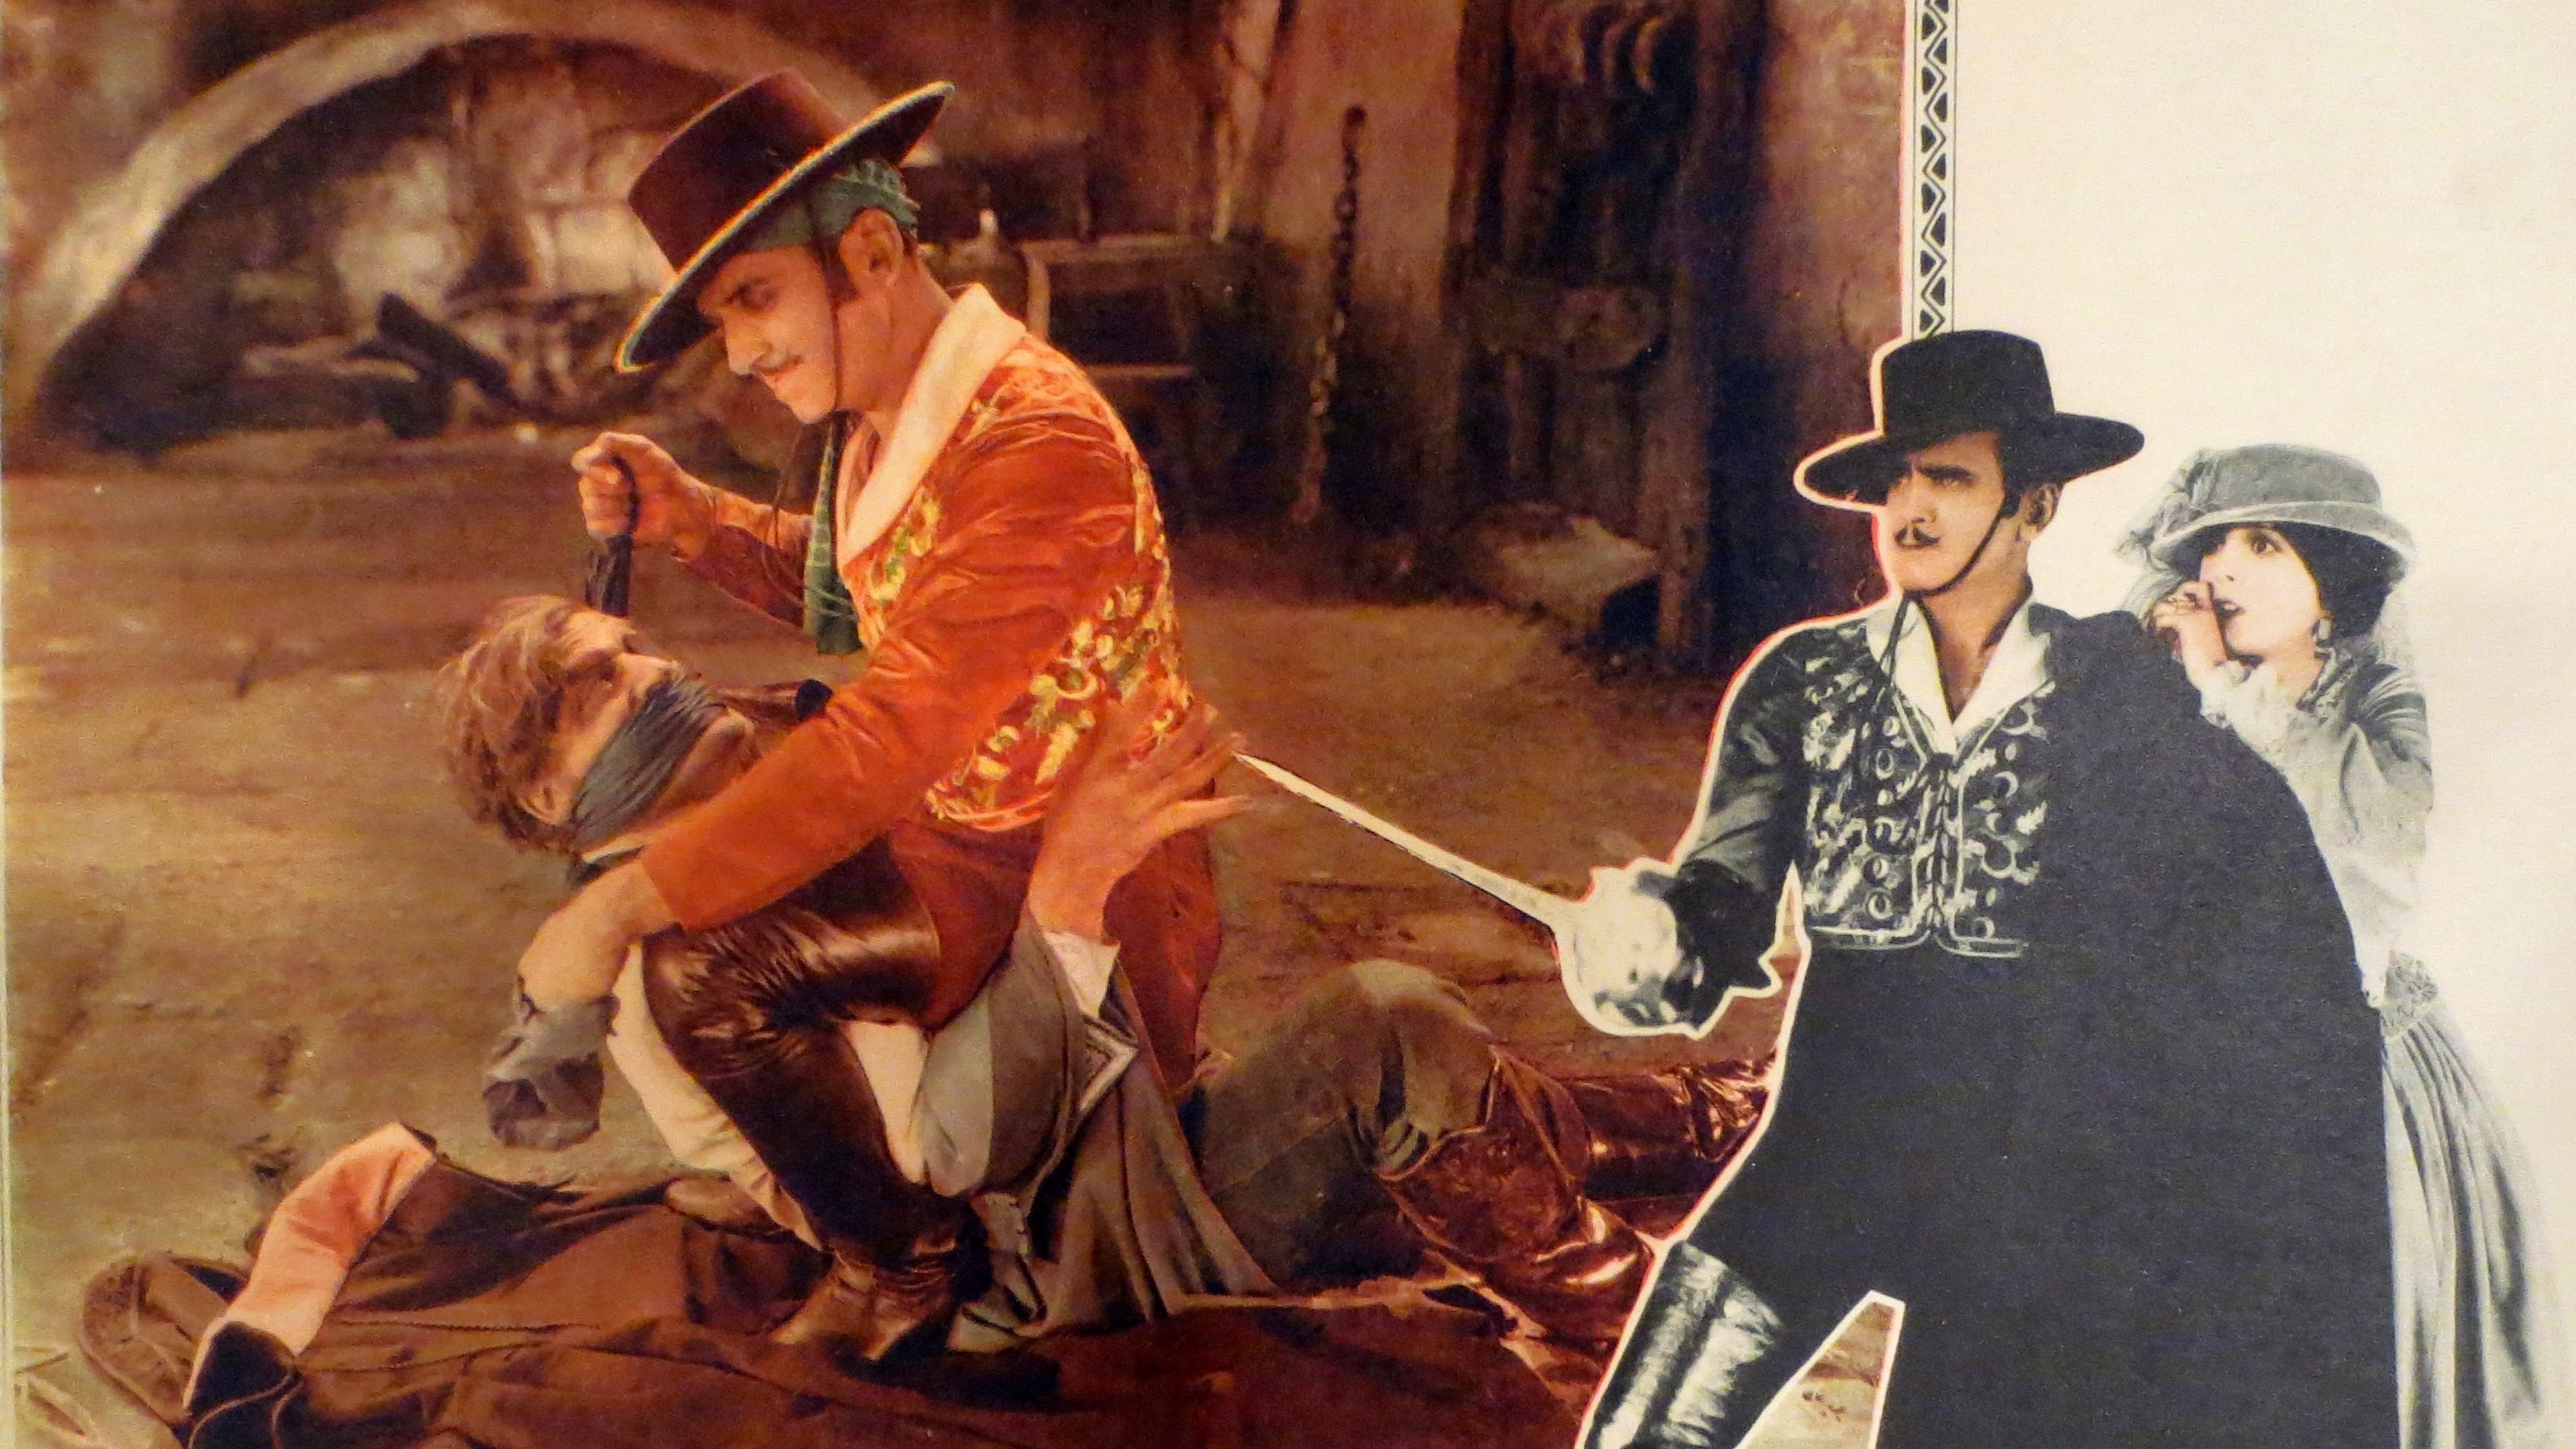 Don Q fils de Zorro (1925)